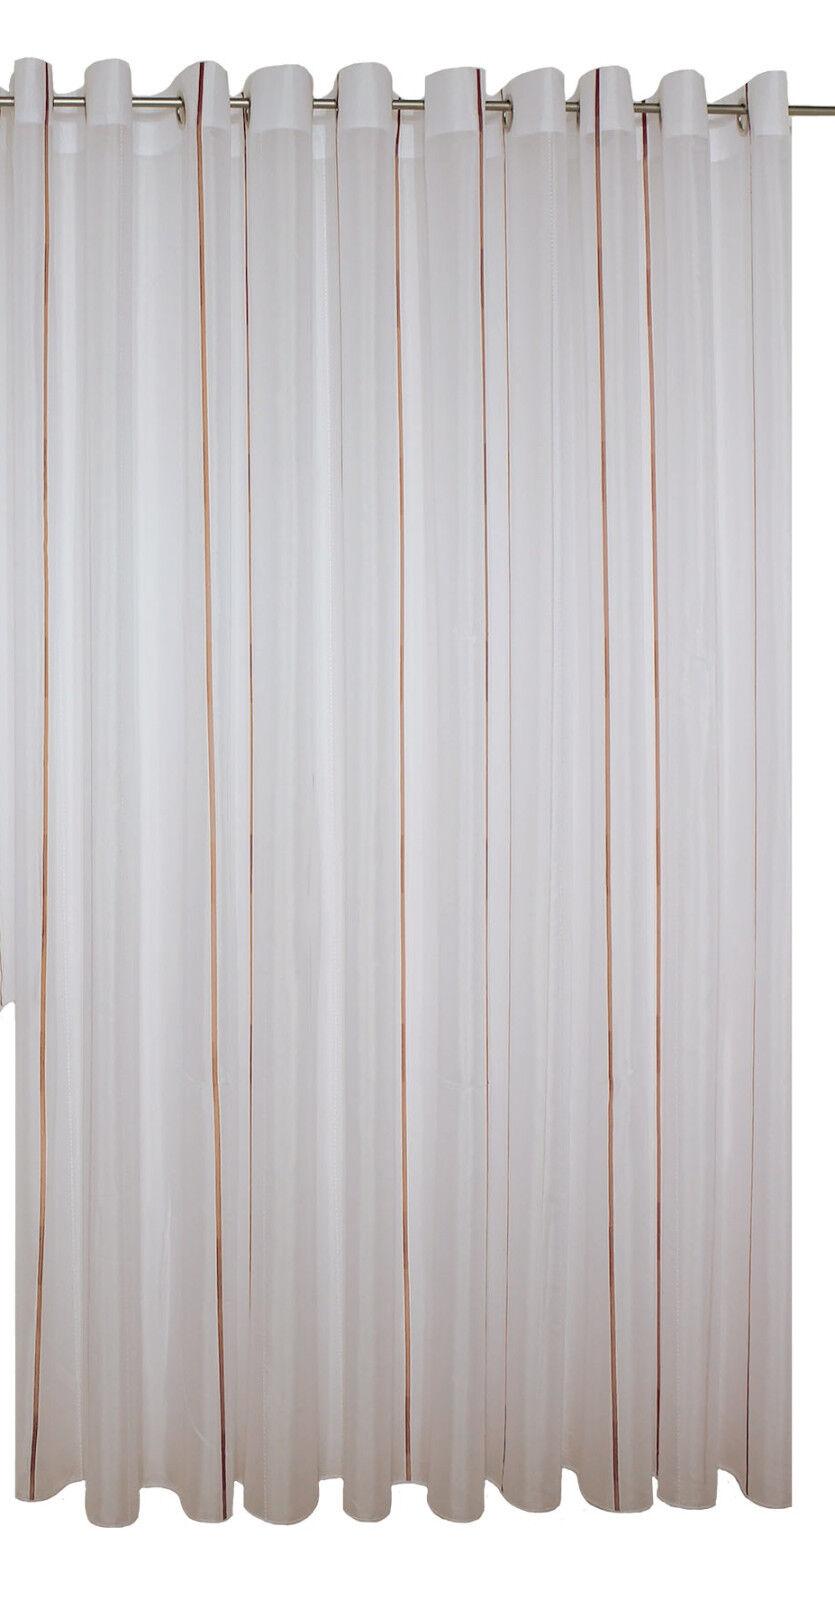 Fertigstores Amilia 3094-50 Farbe terracotta auf Ösen Ösen Ösen halbtransparent  16 Größen 9785a4